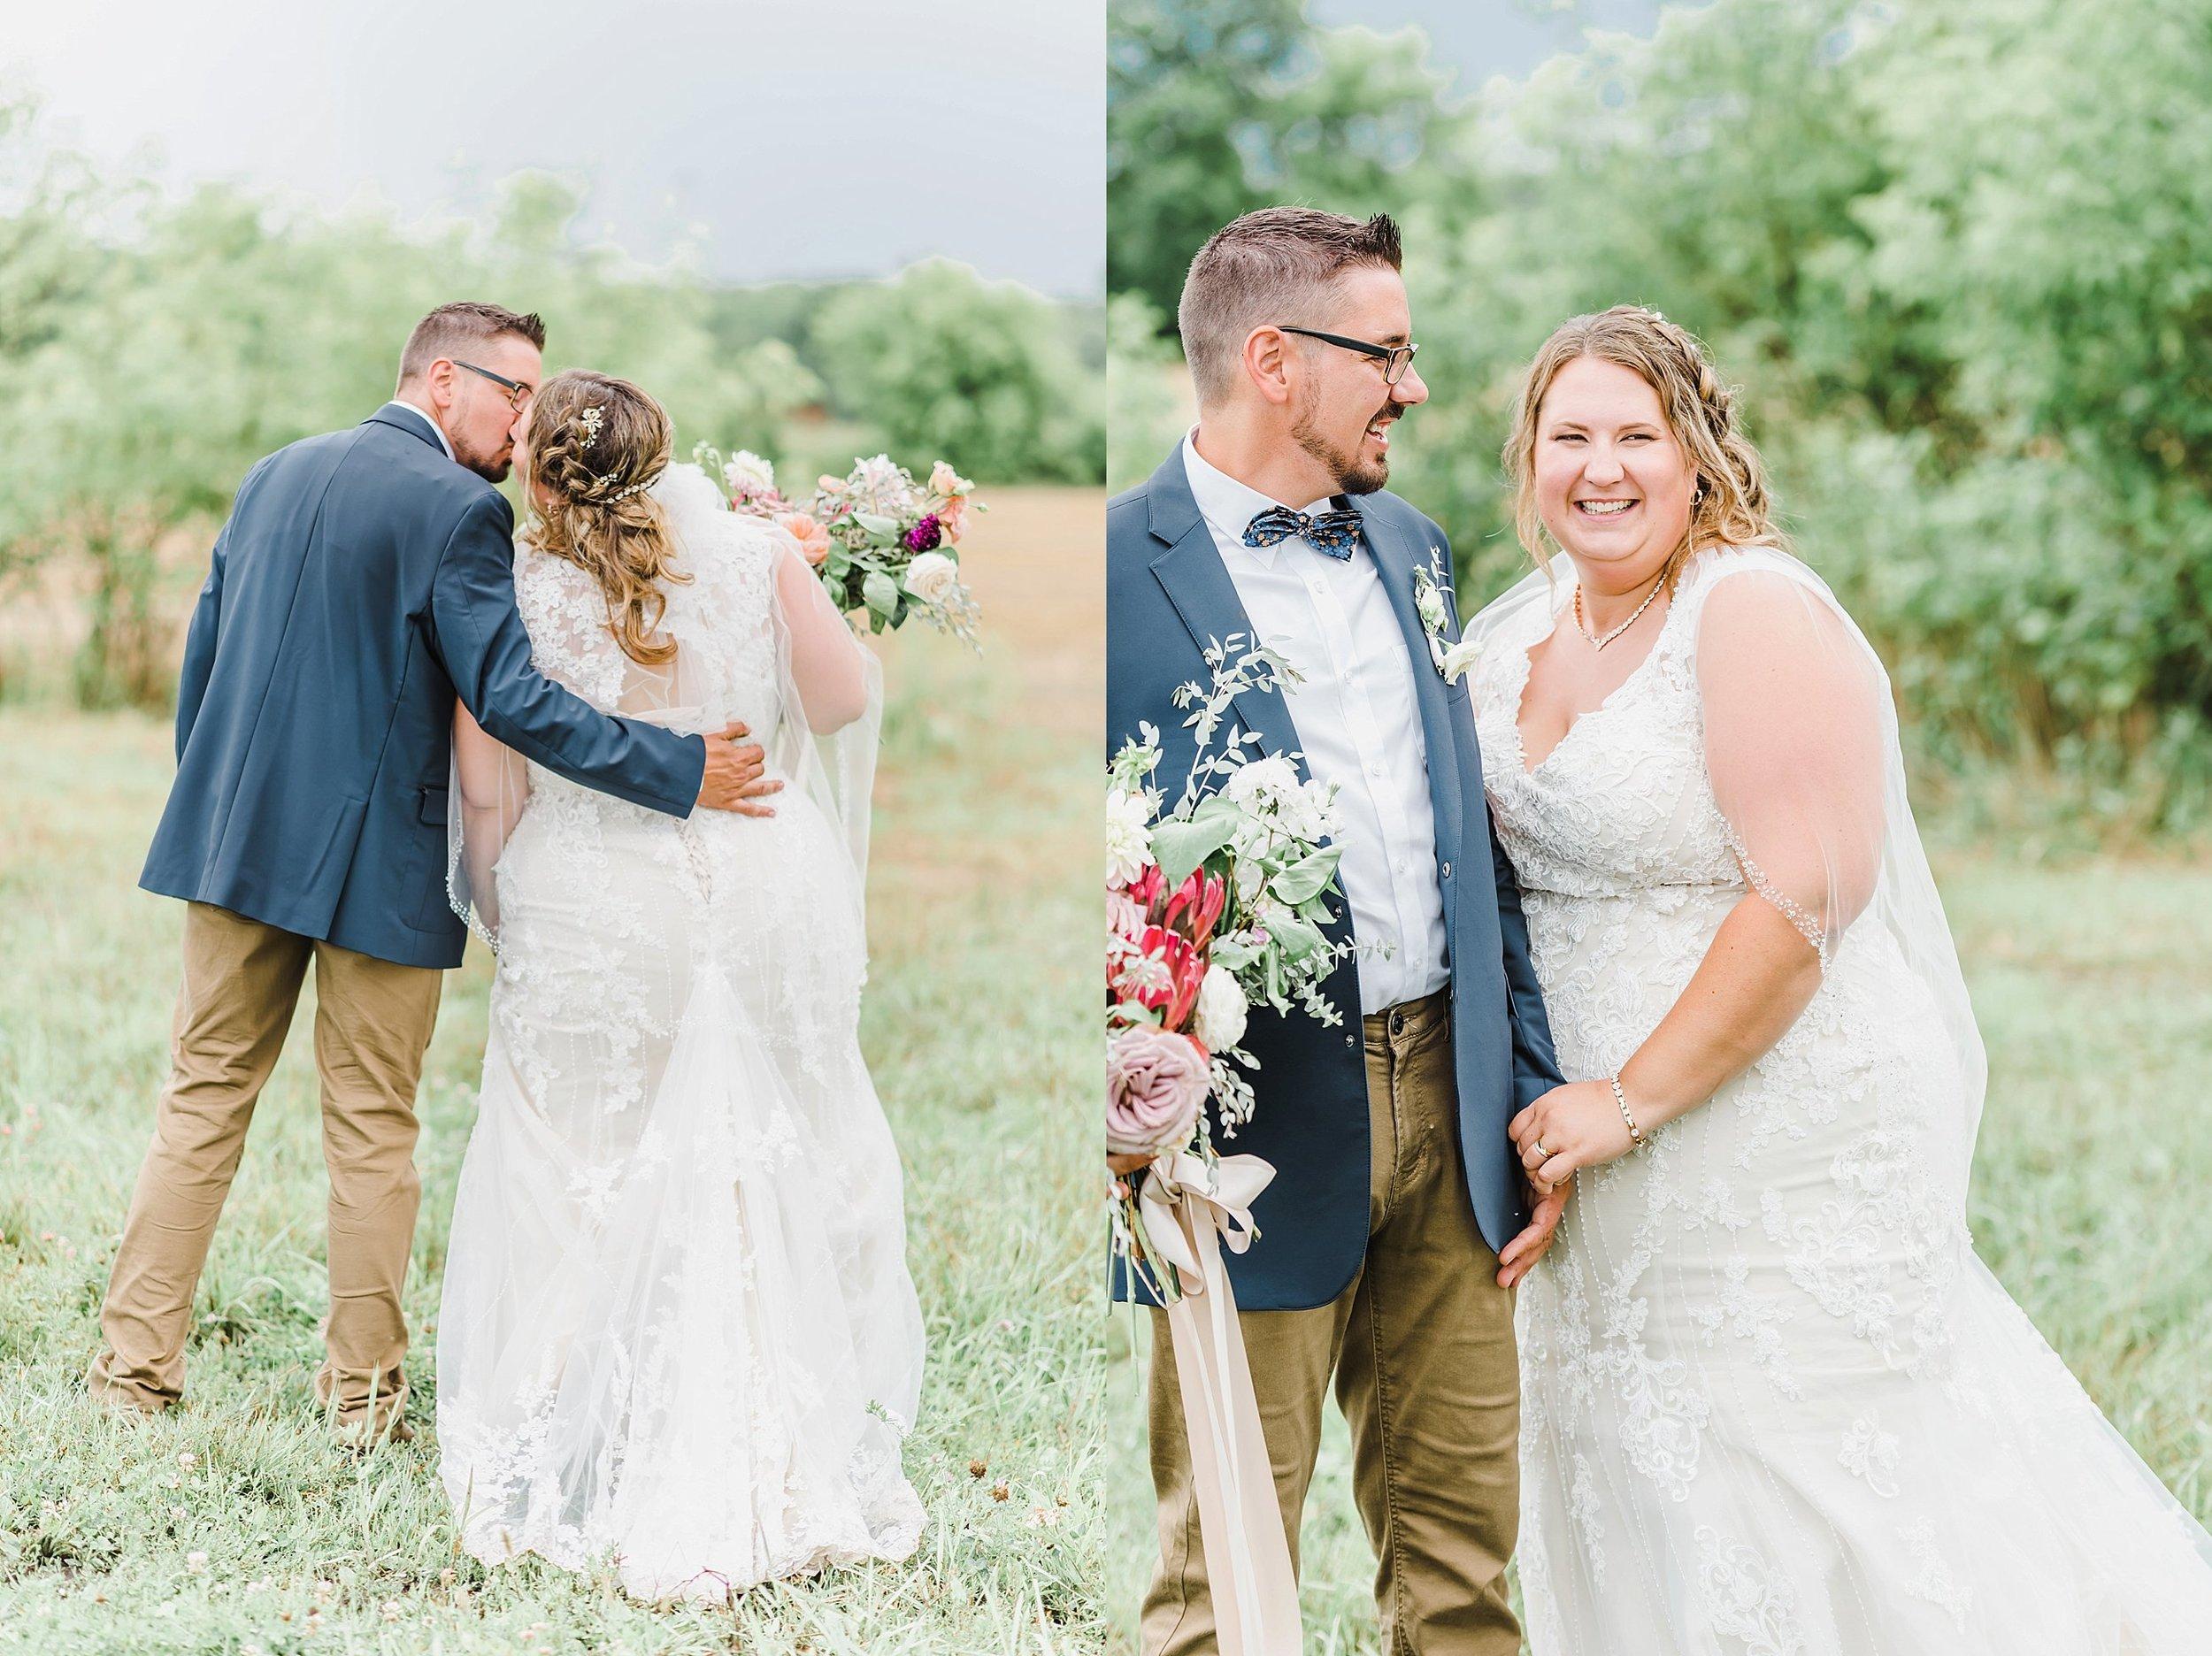 light airy indie fine art ottawa wedding photographer | Ali and Batoul Photography_0412.jpg